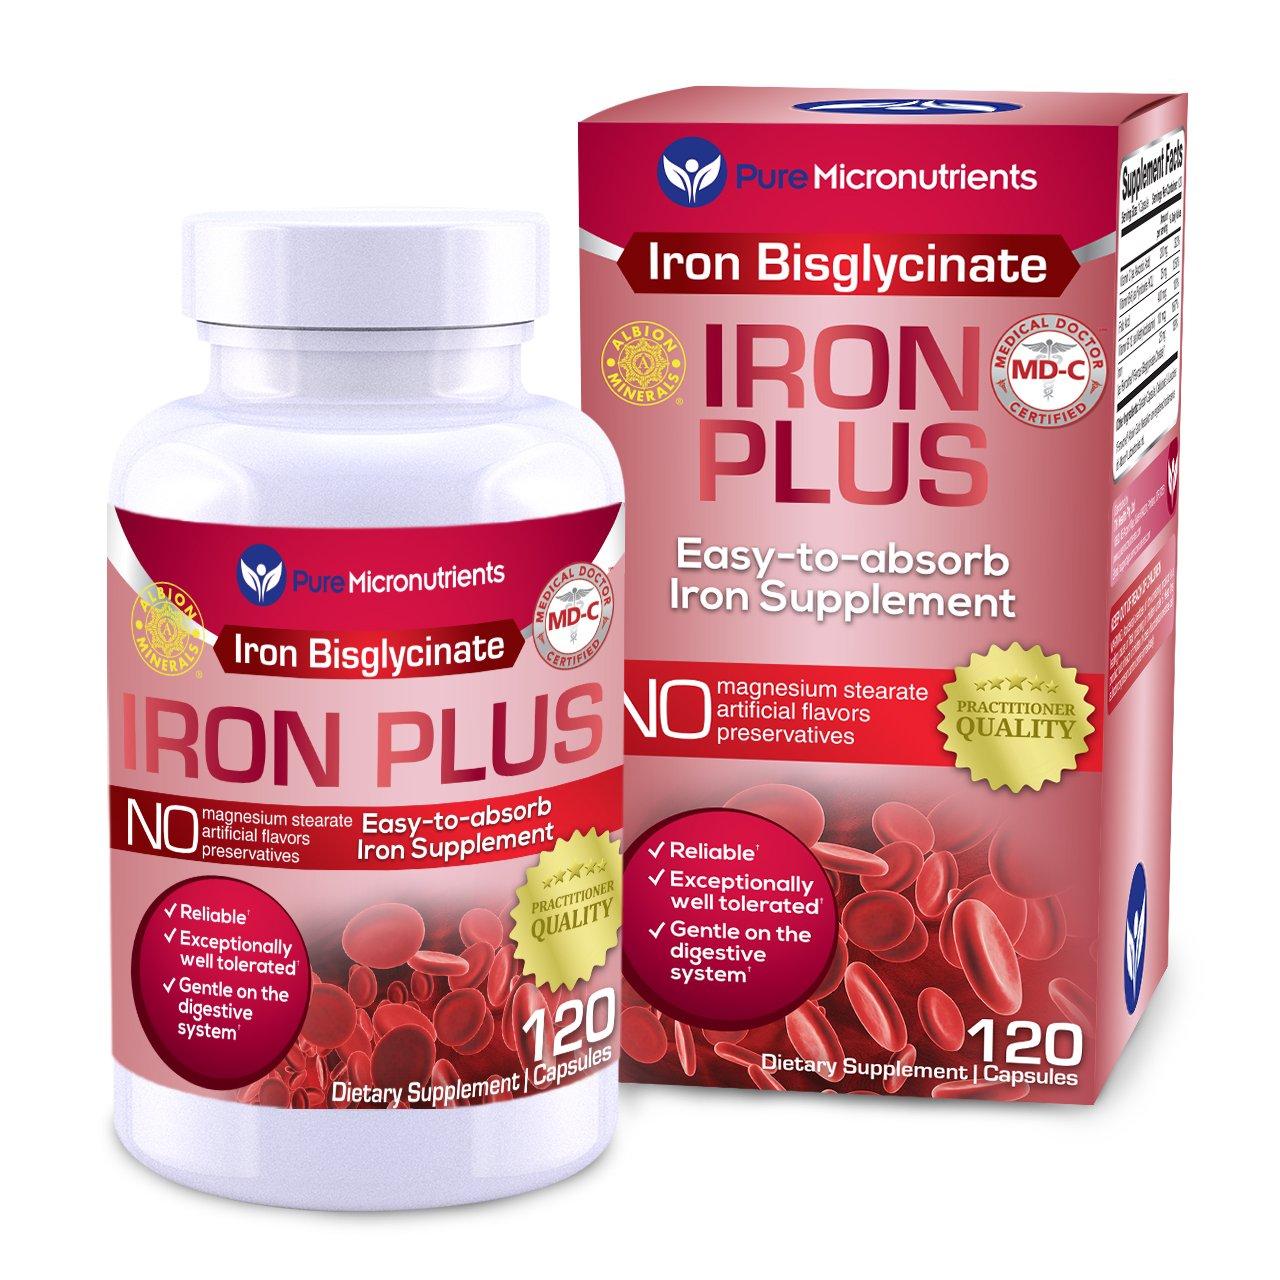 Pure Micronutrients Iron Plus Supplement, Natural Ferrous Chelate, Bisglycinate 25mg + Vitamin C, B6, B12, Folic Acid, 120 Count